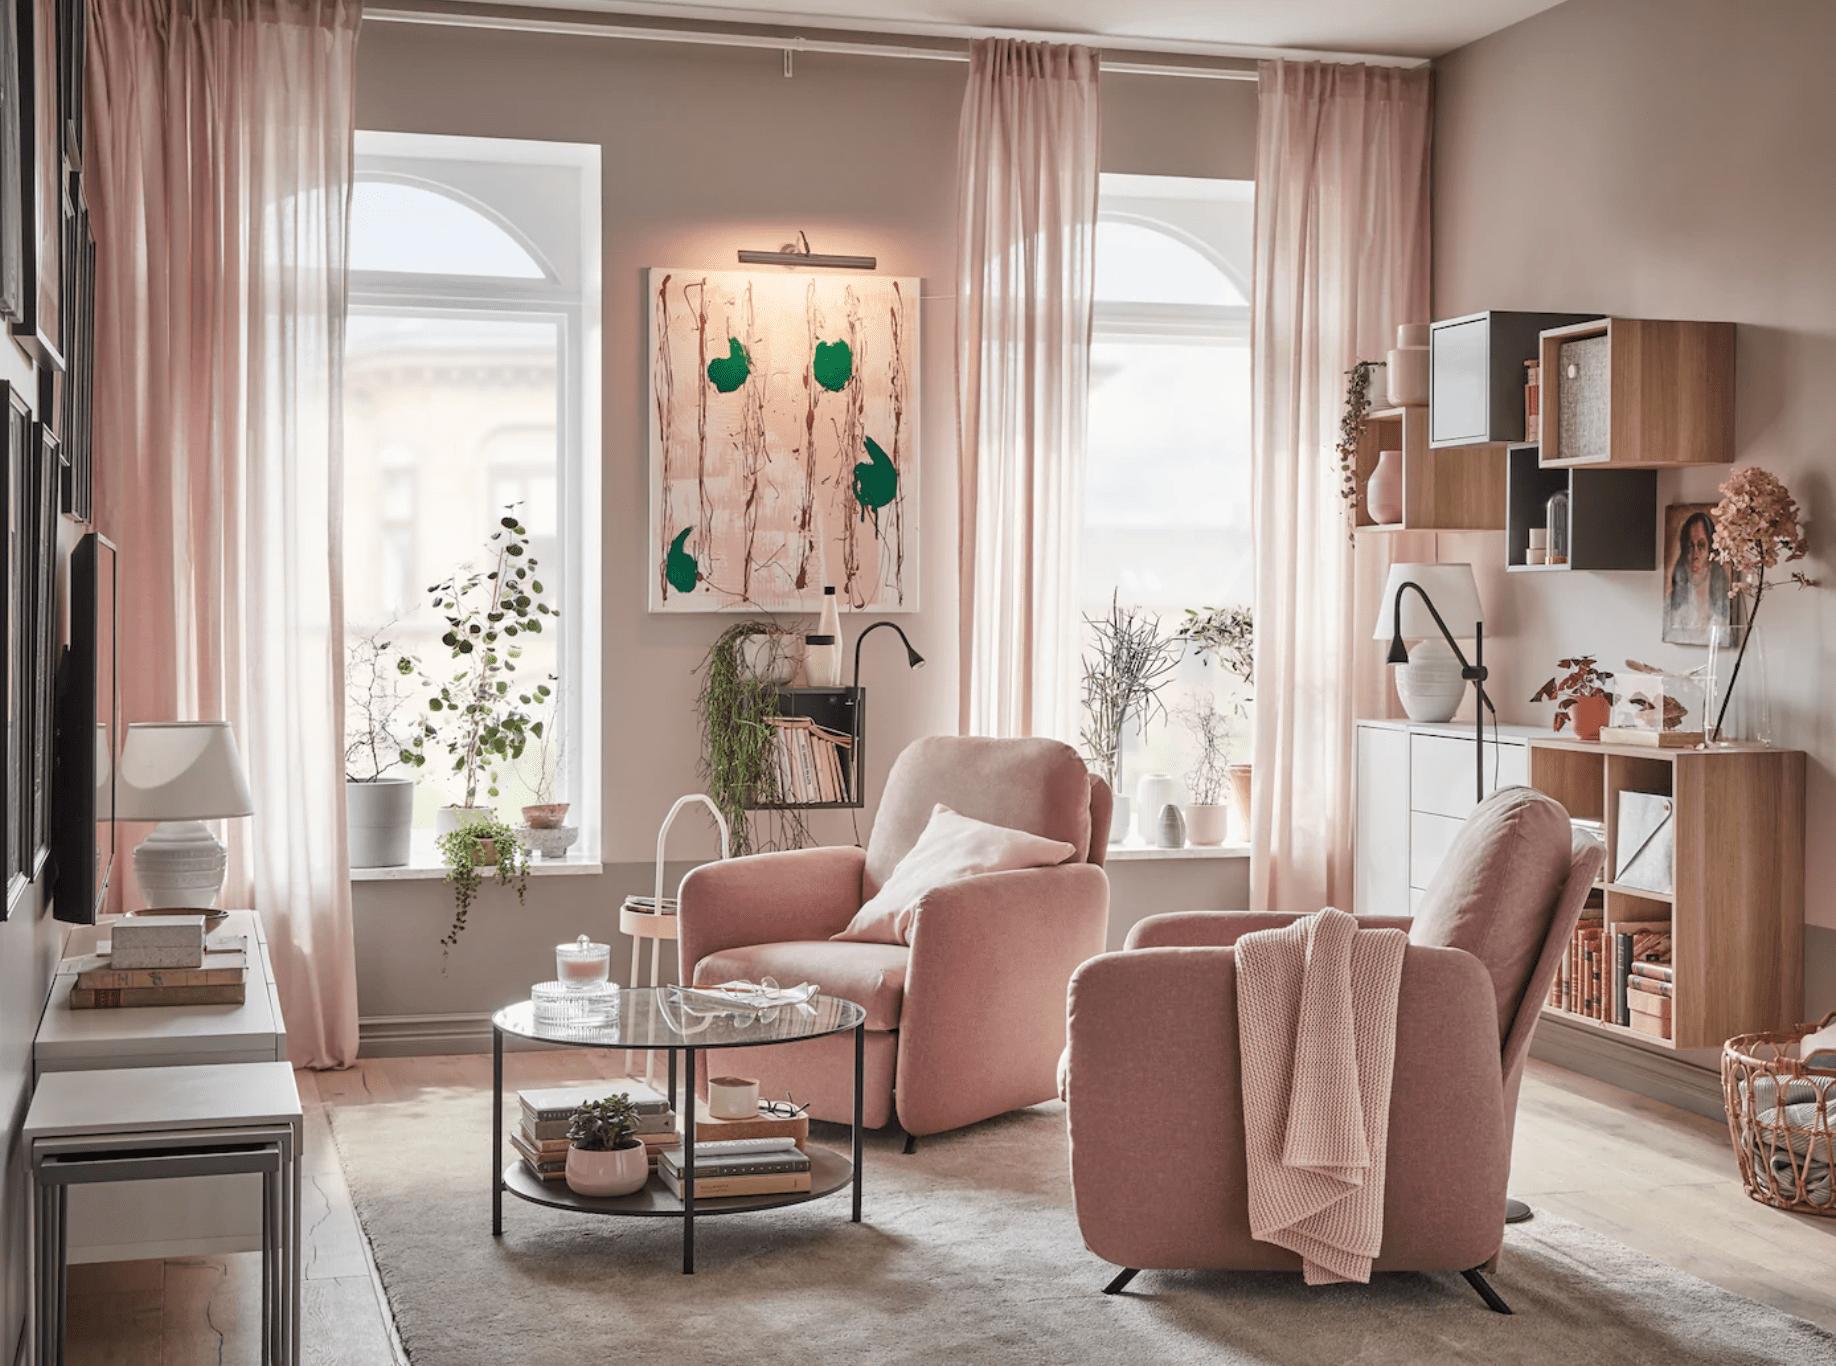 IKEA Fall Home Design Trends: Best Fall Decor Trends